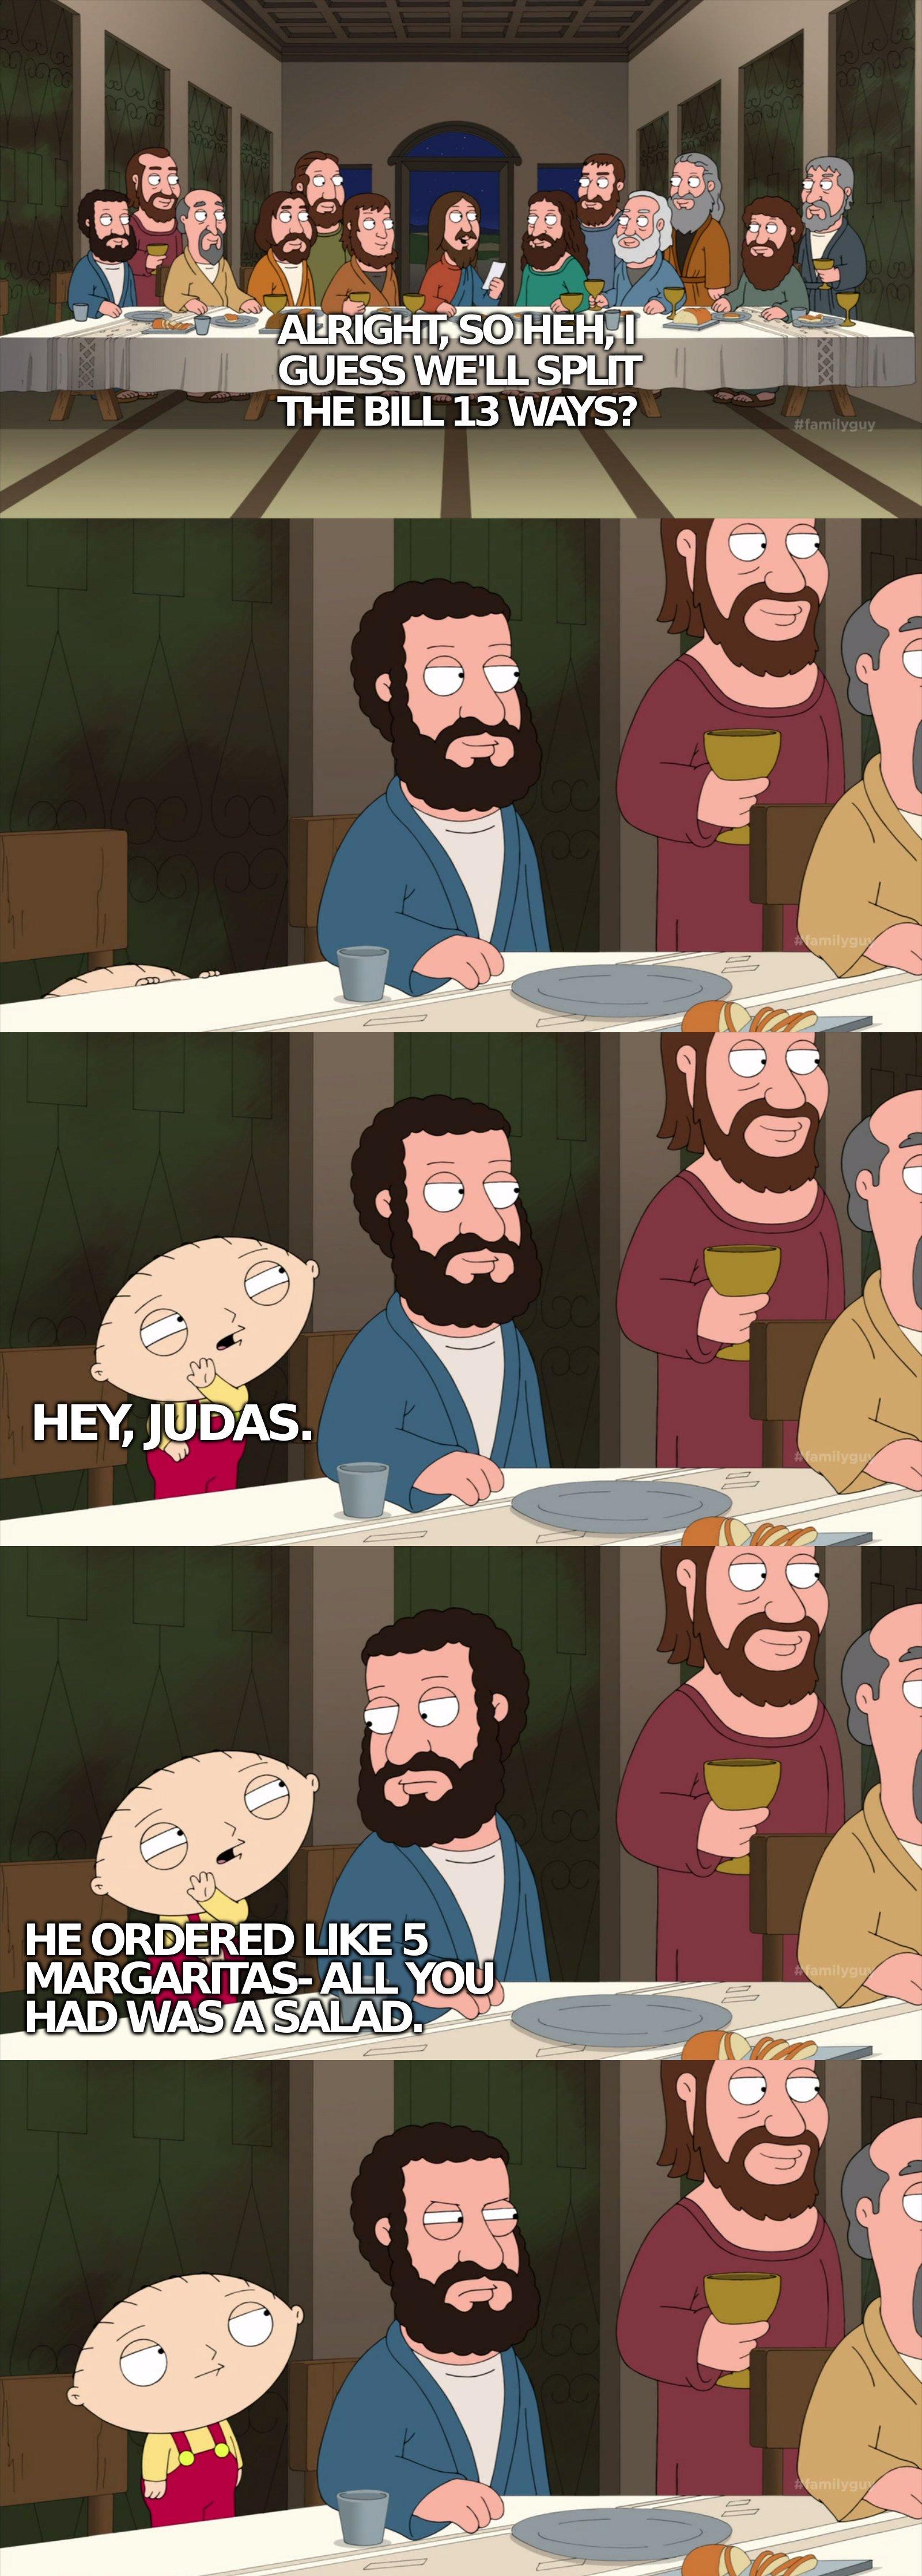 The Judas Chronicle